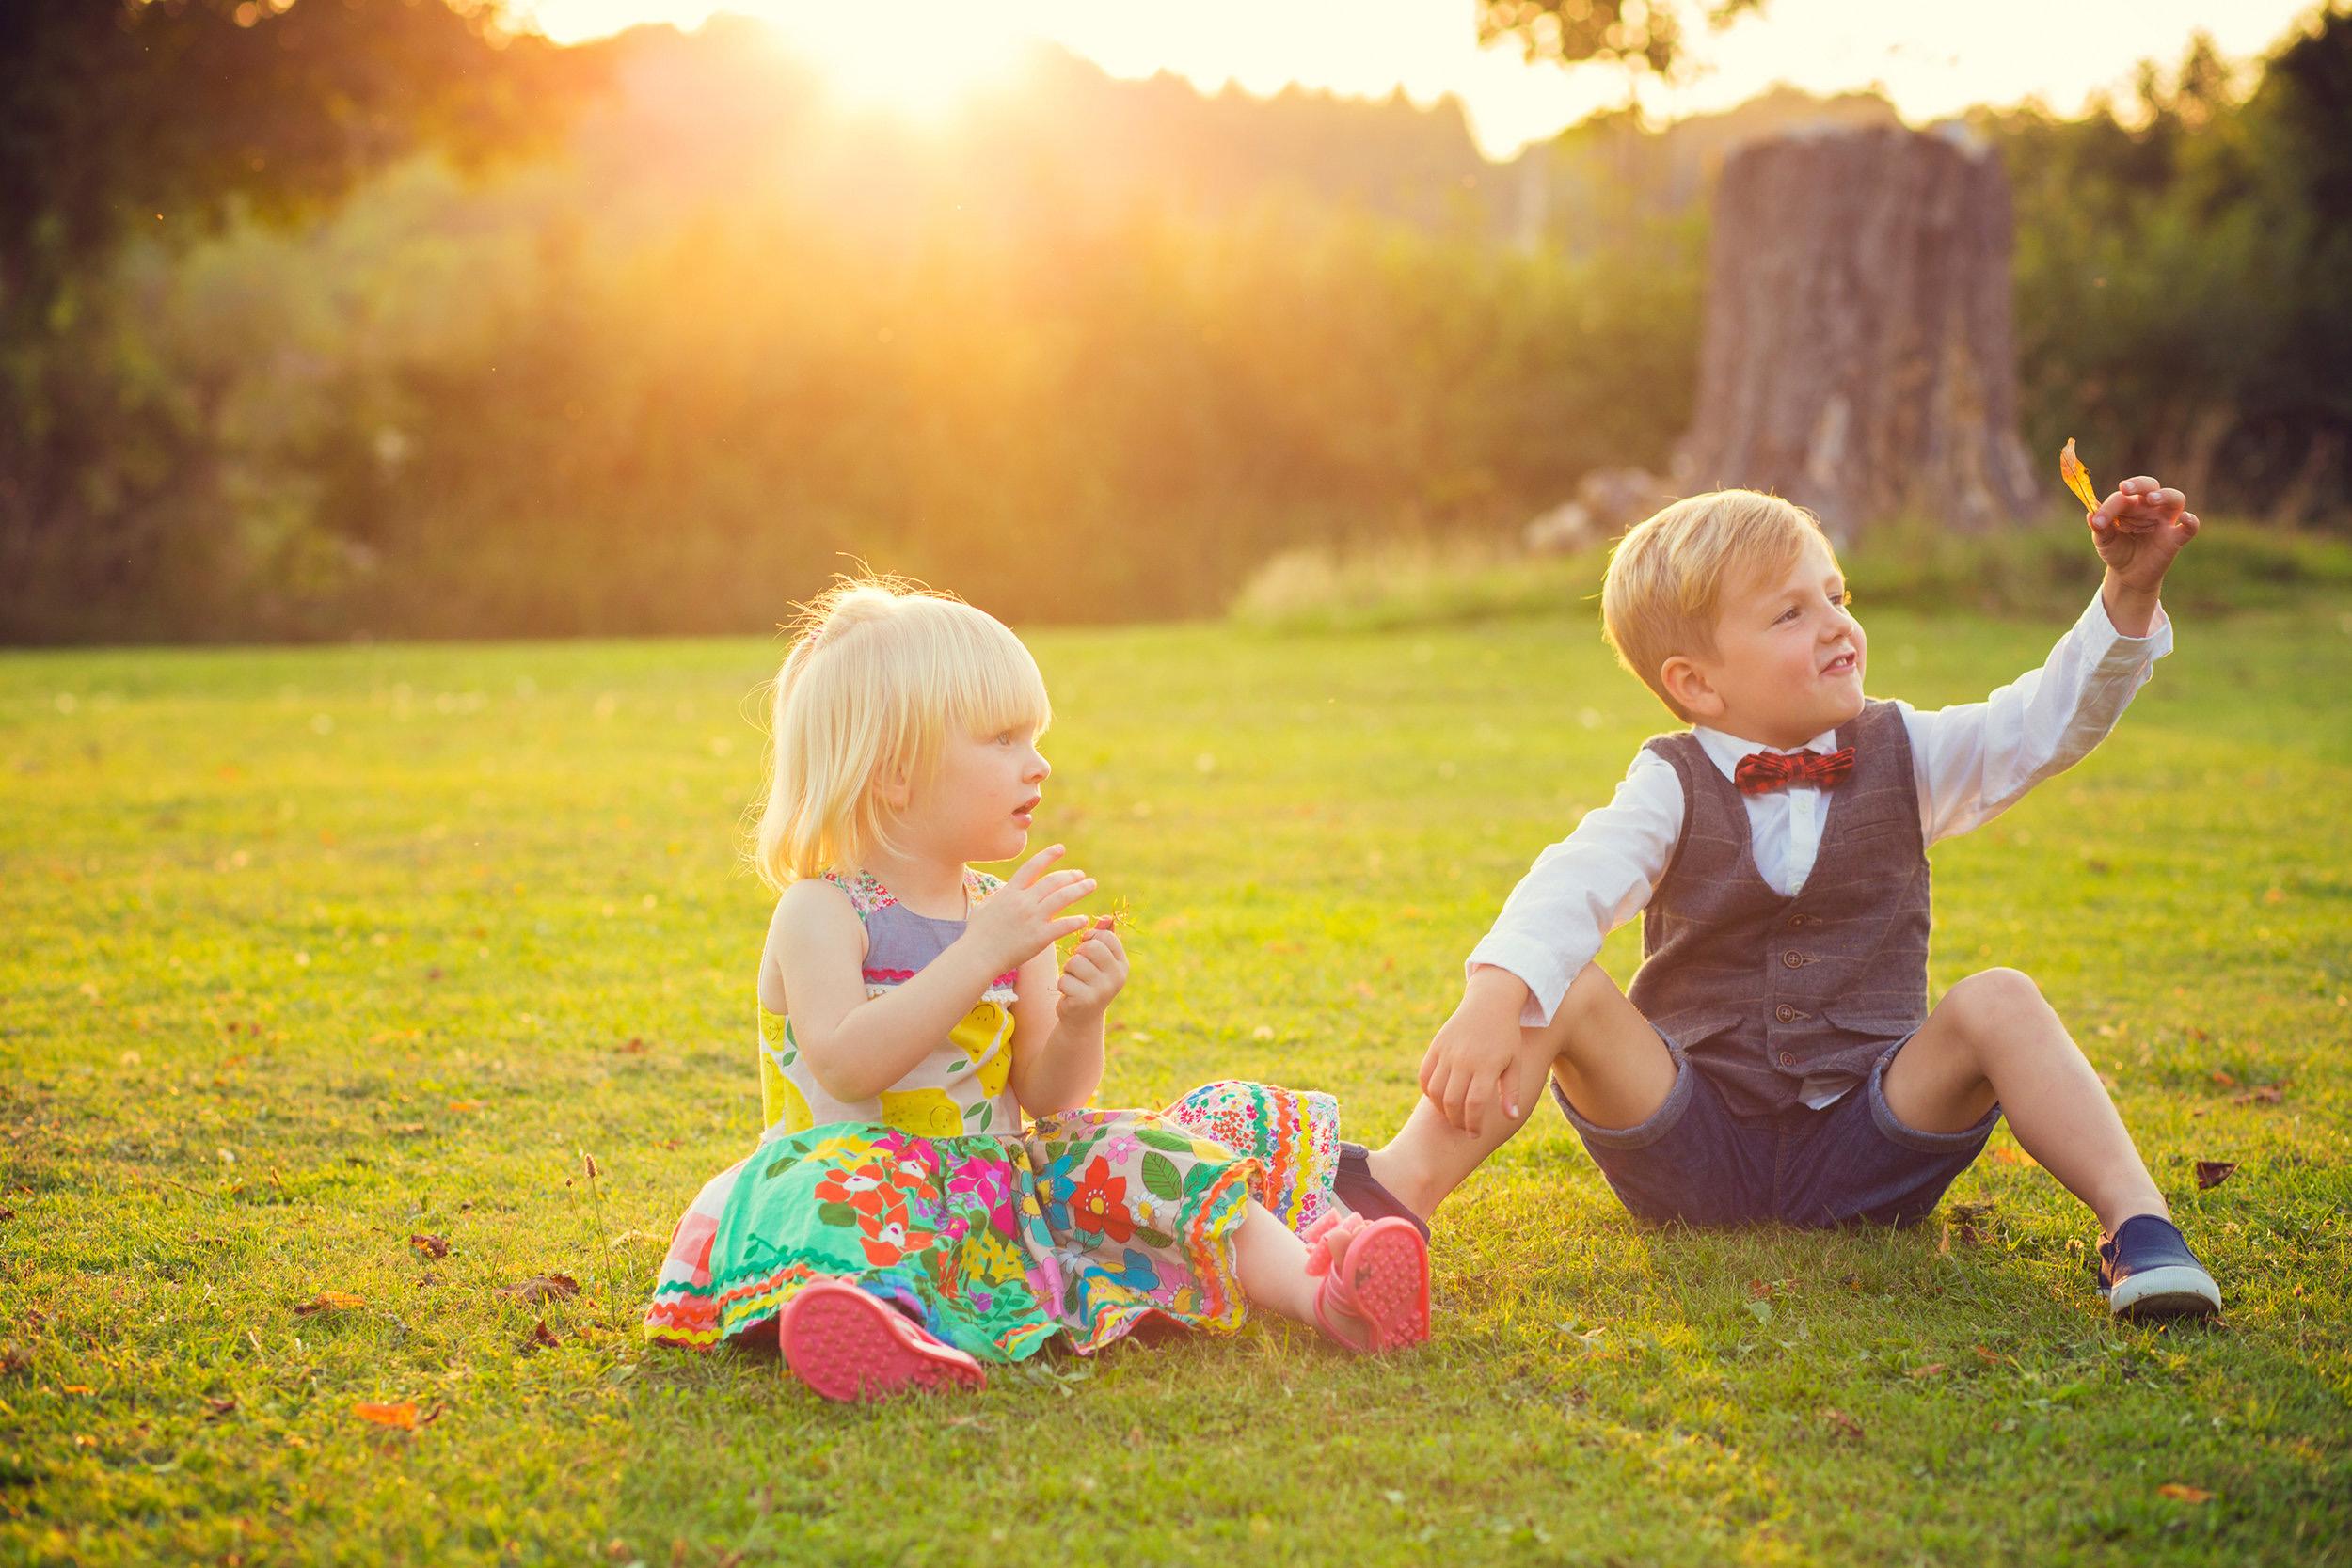 Childrens Photographer.jpg